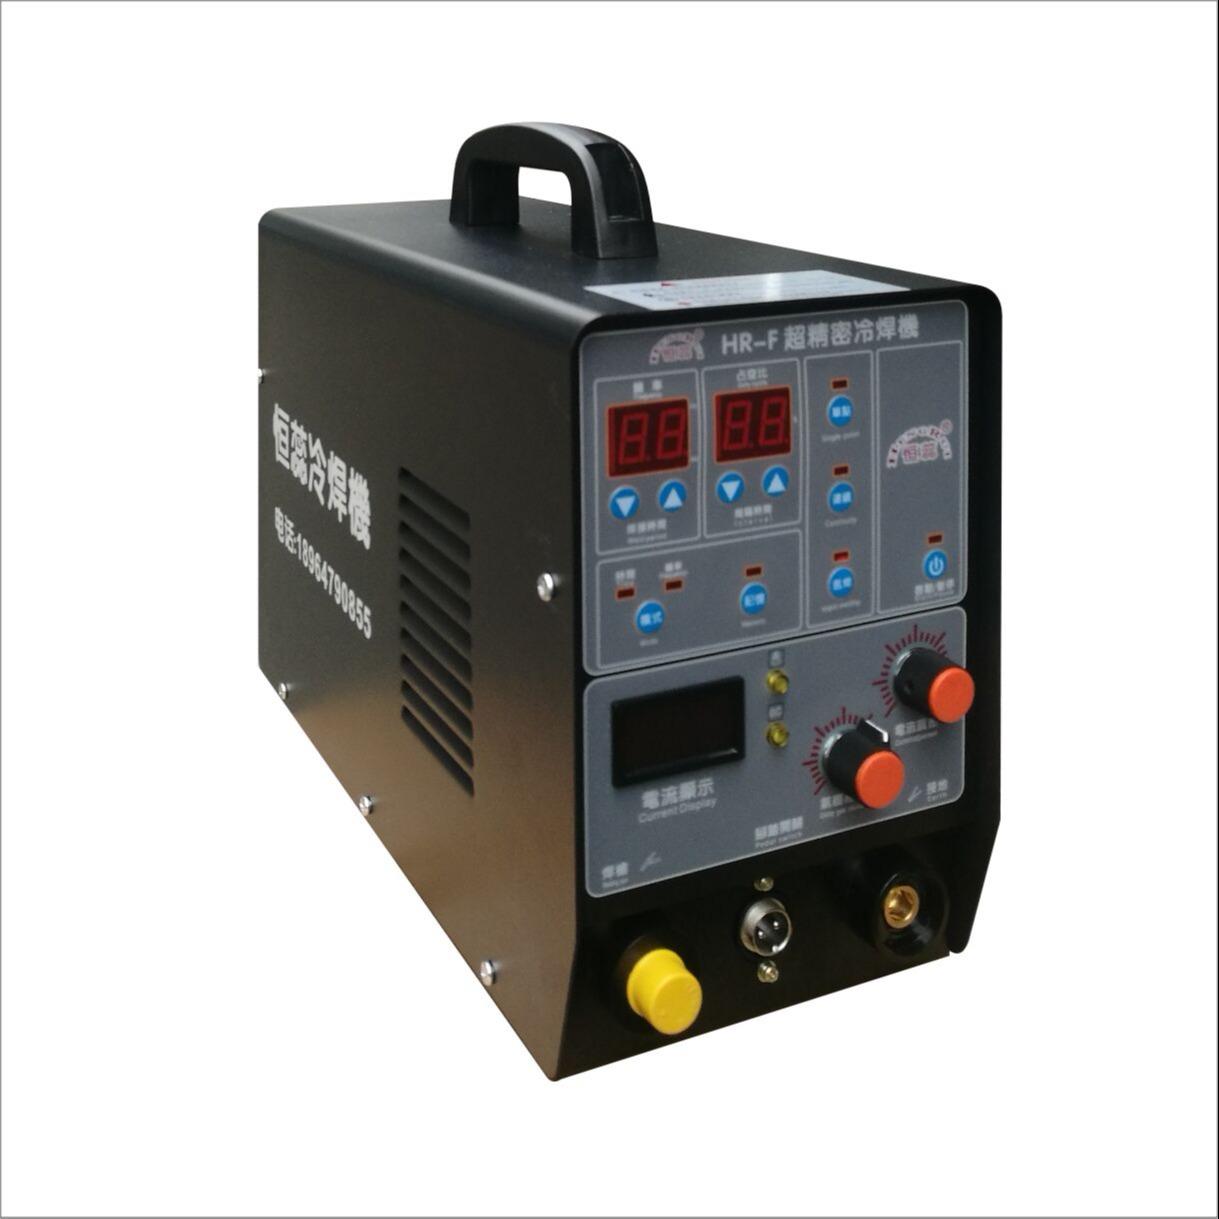 HR-F超精密焊接冷焊机何先生恒蕊 不锈钢焊接冷焊机小何